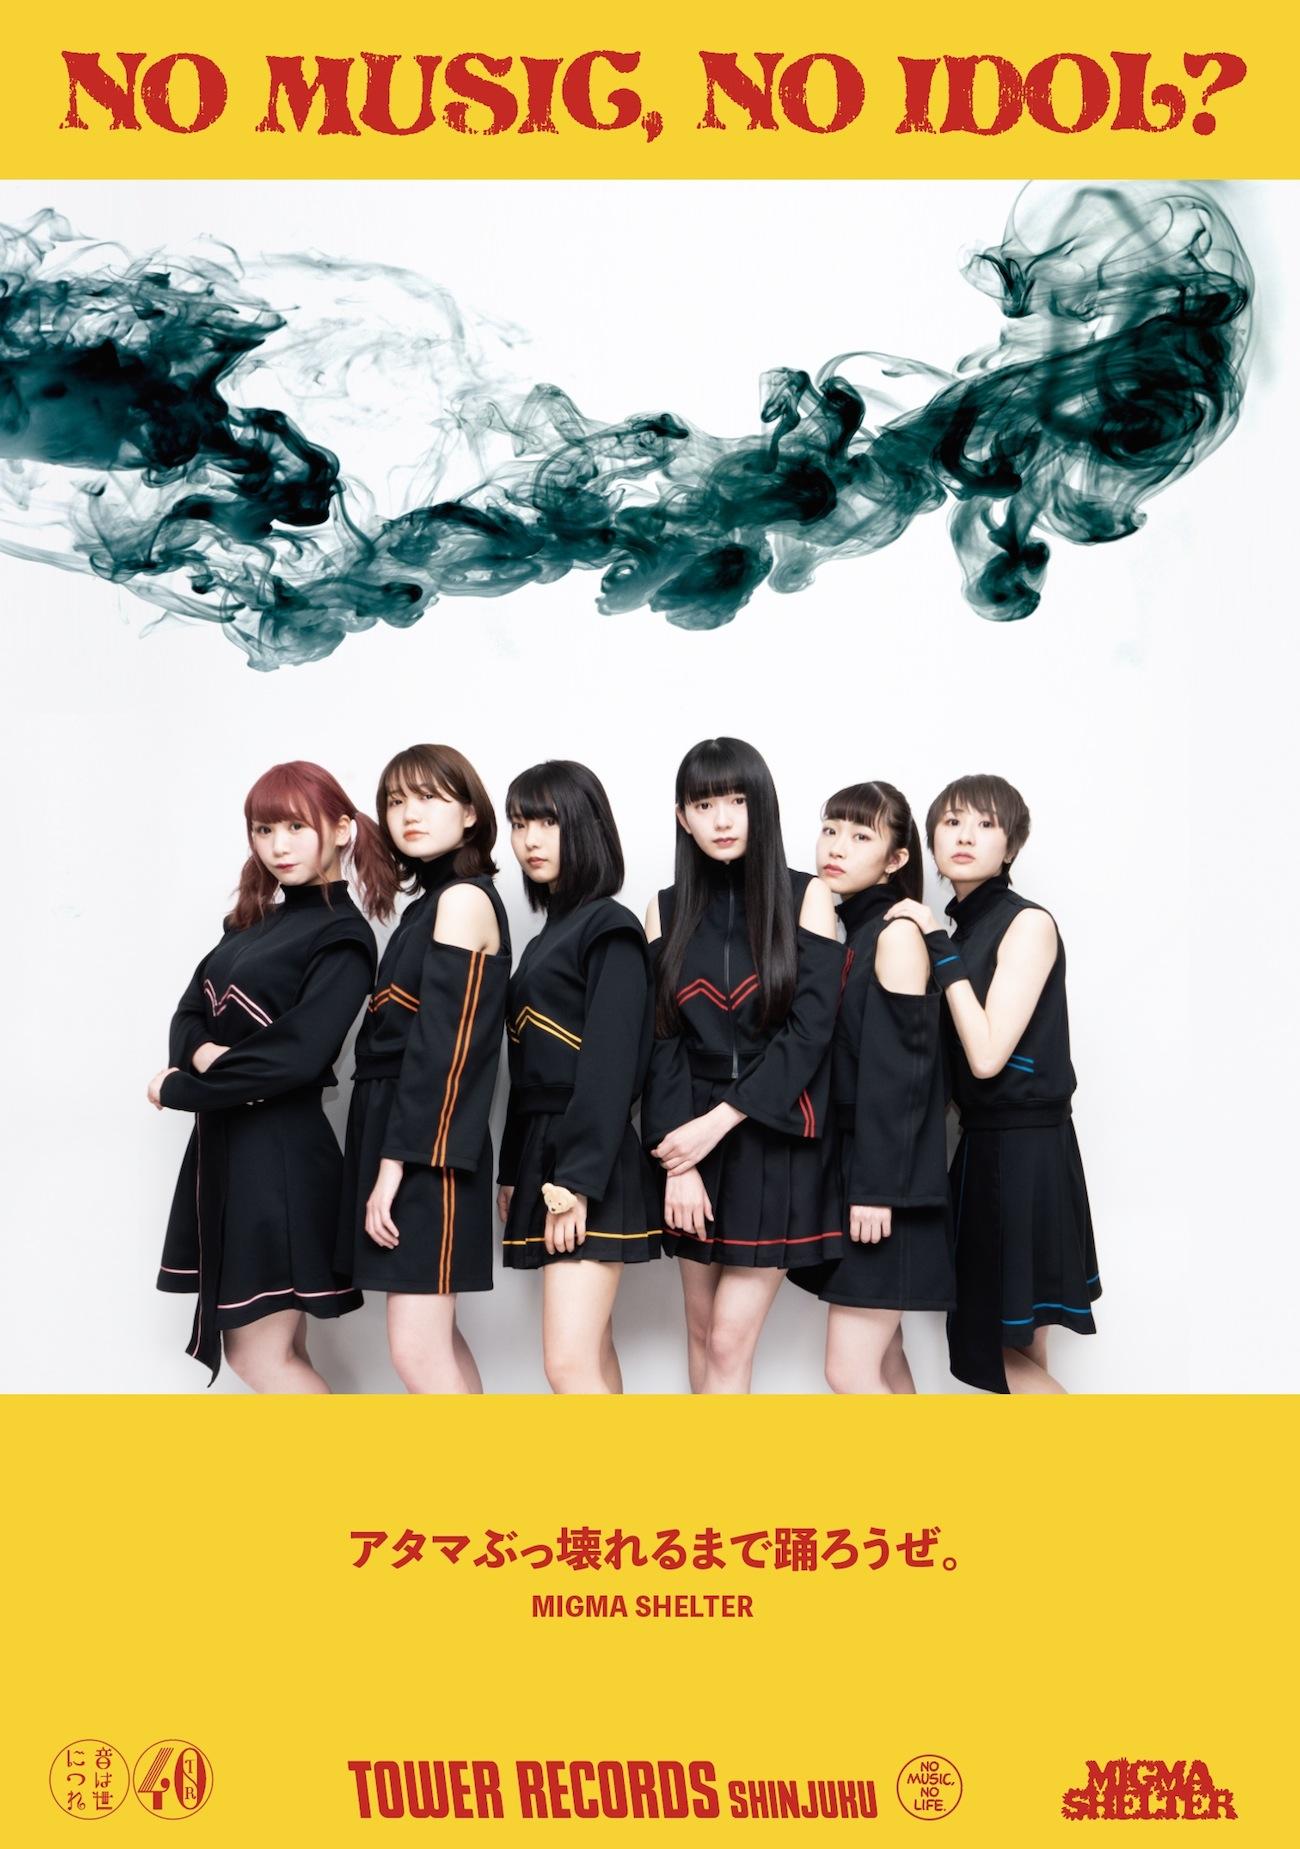 MIGMA SHELTER(ミグマシェルター)/タワーレコード アイドル企画「NO MUSIC, NO IDOL?」ポスター